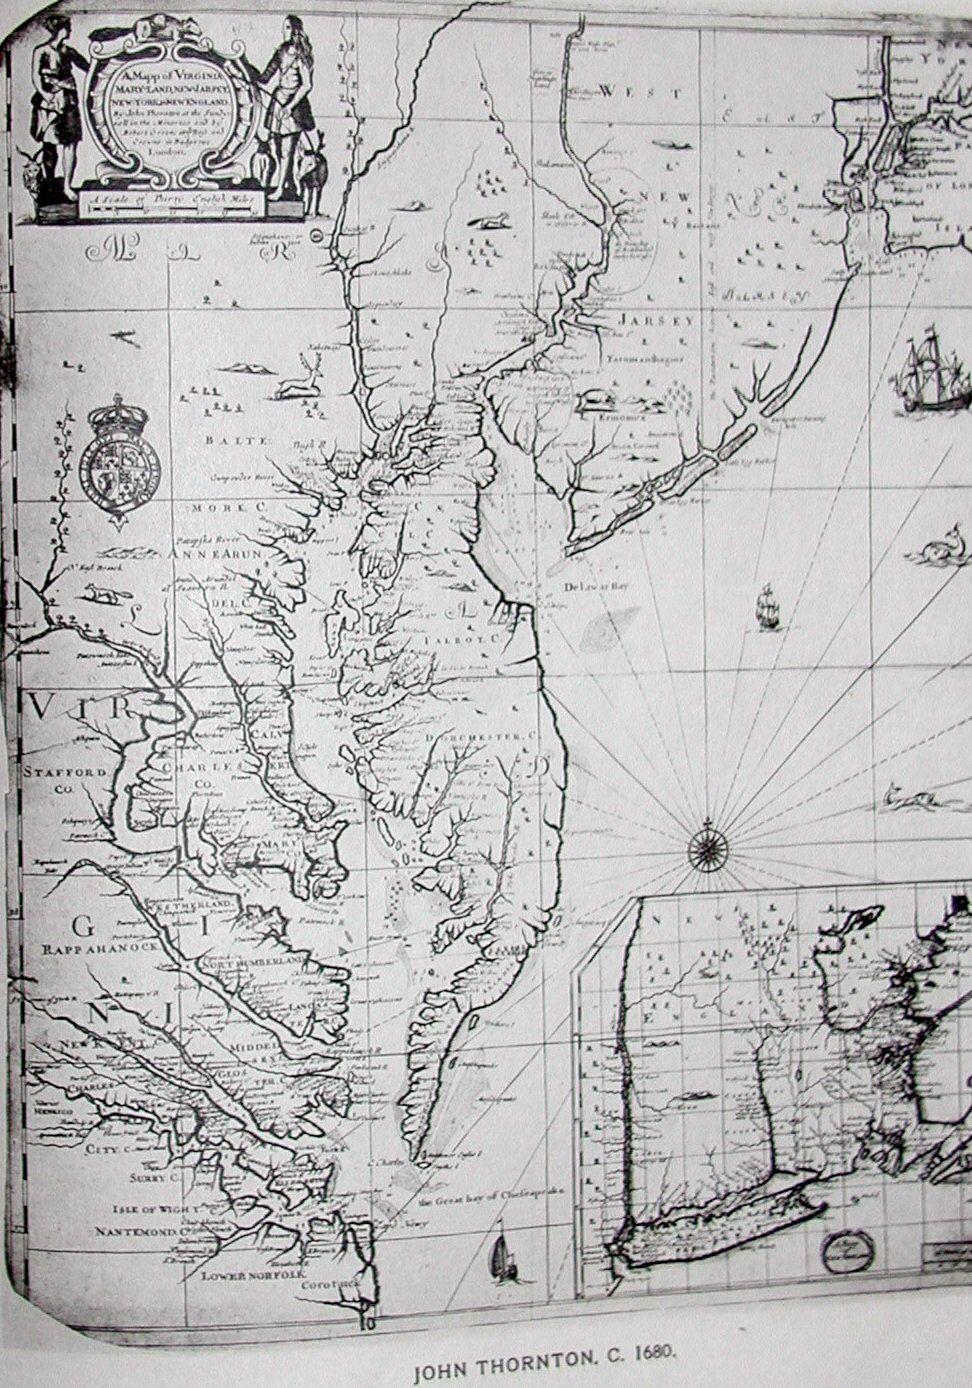 Image from http://www.mapsofpa.com/17thcentury/1678thornton.jpg.